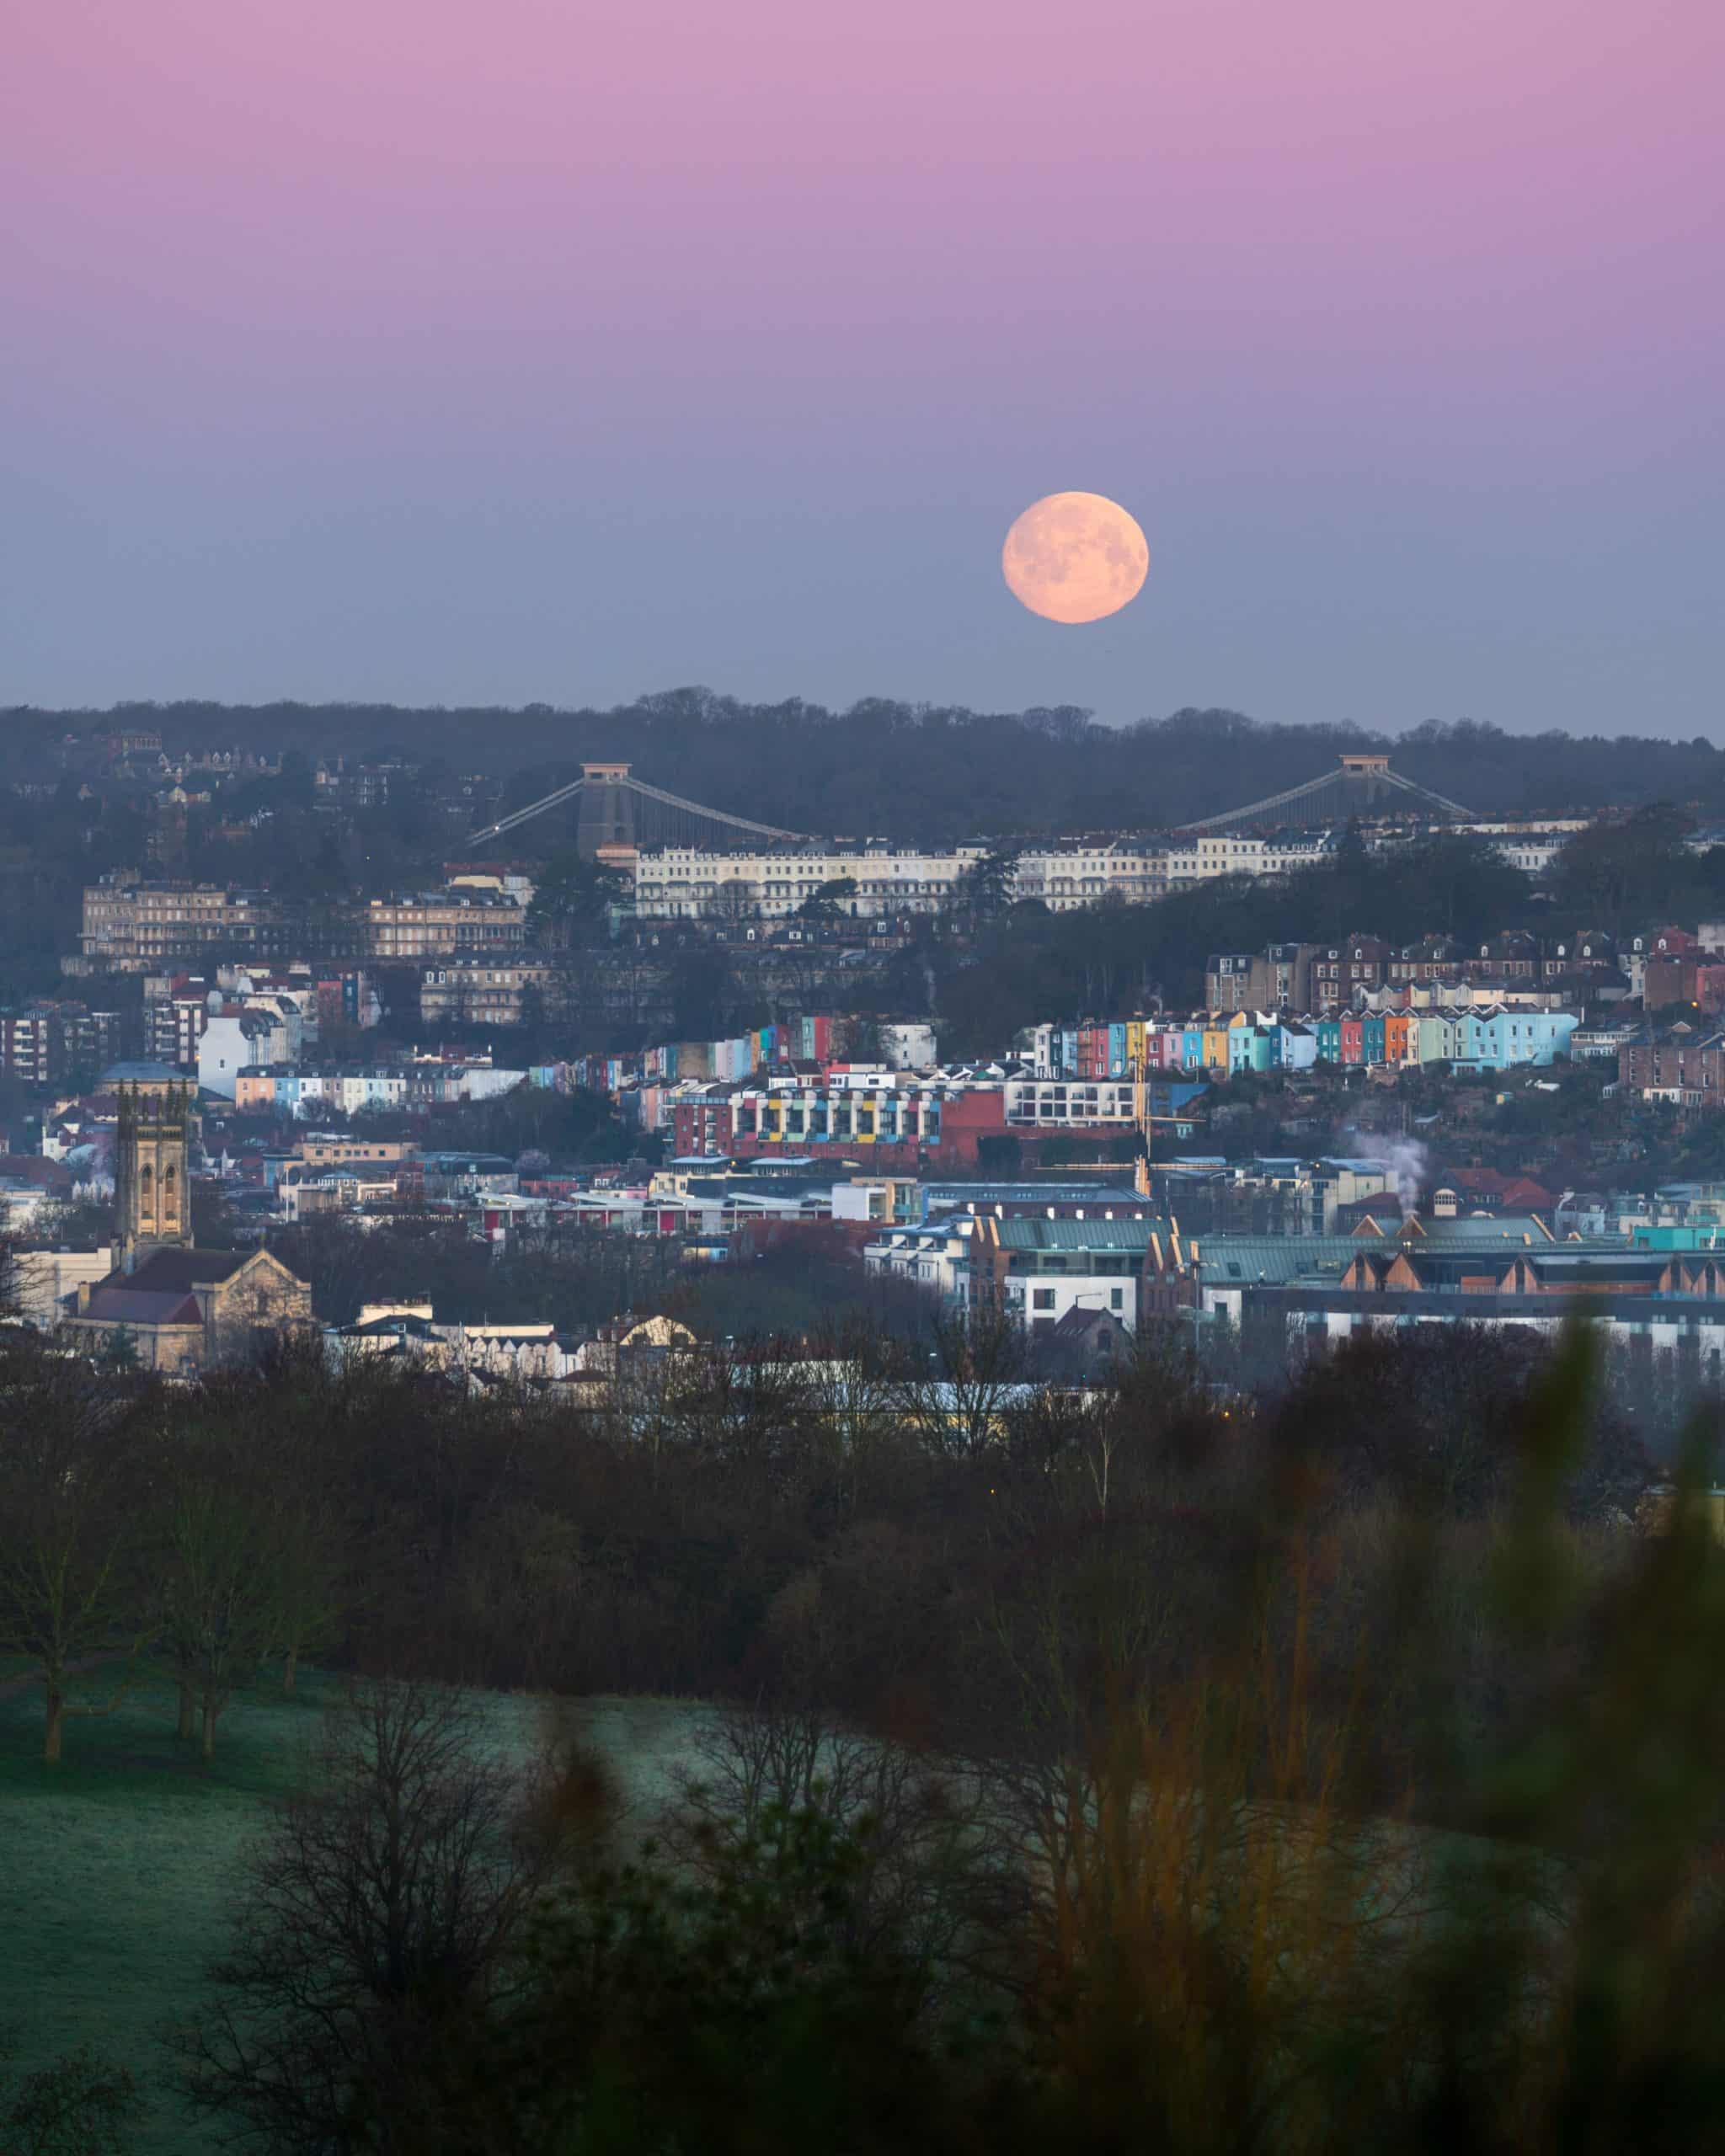 A fine art cityscape print of the full moon from Perrett Park in Bristol